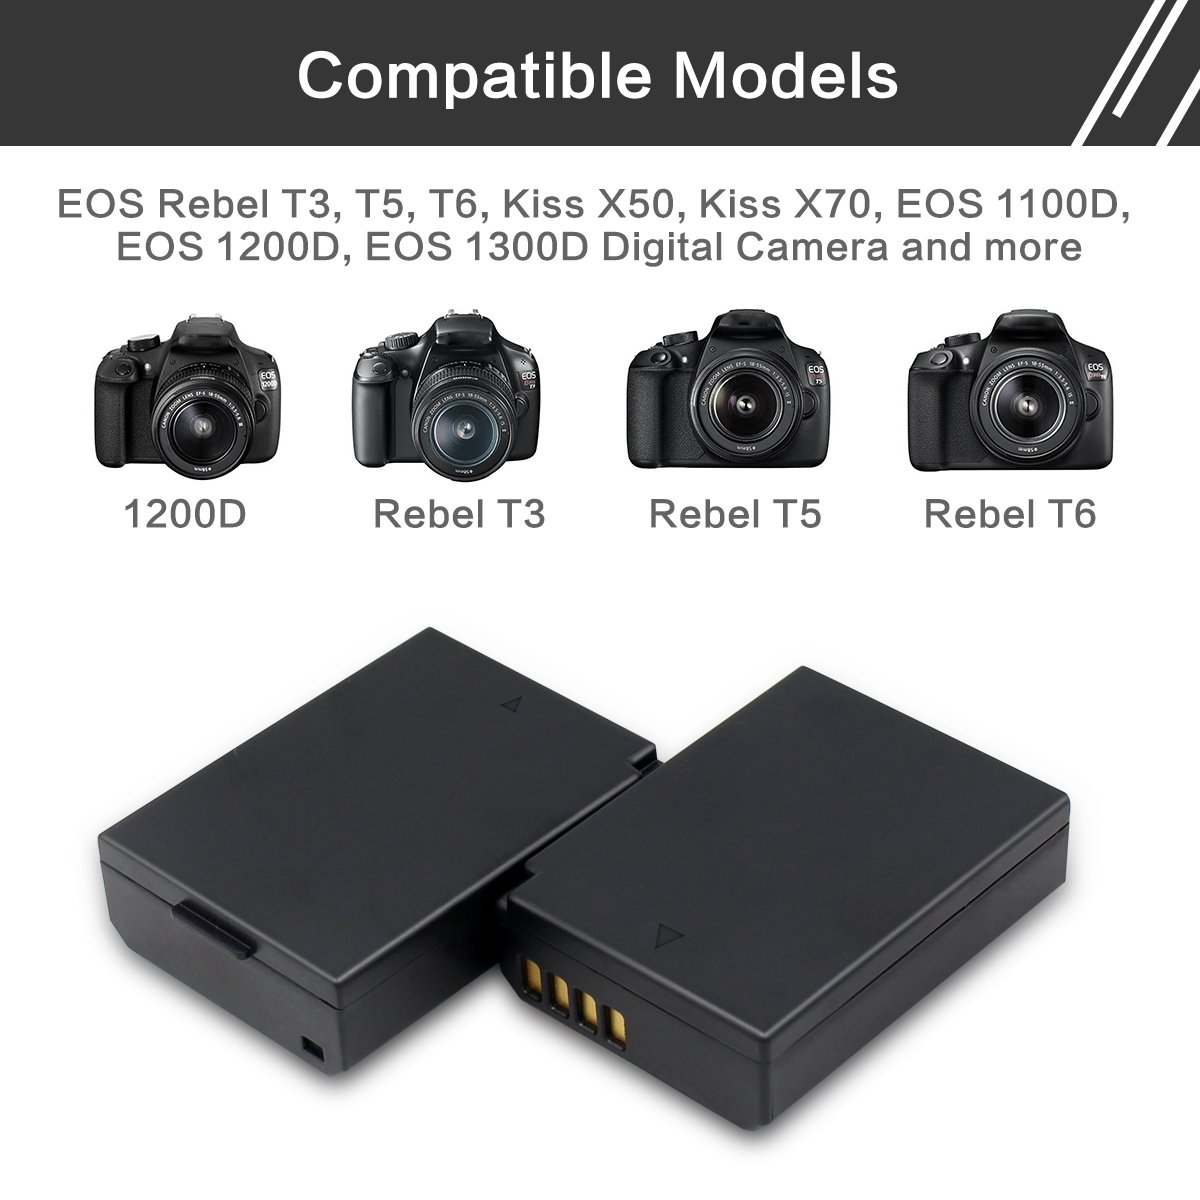 Amazon.com: LP-E10 - Batería de repuesto para Canon LP-E10 y ...